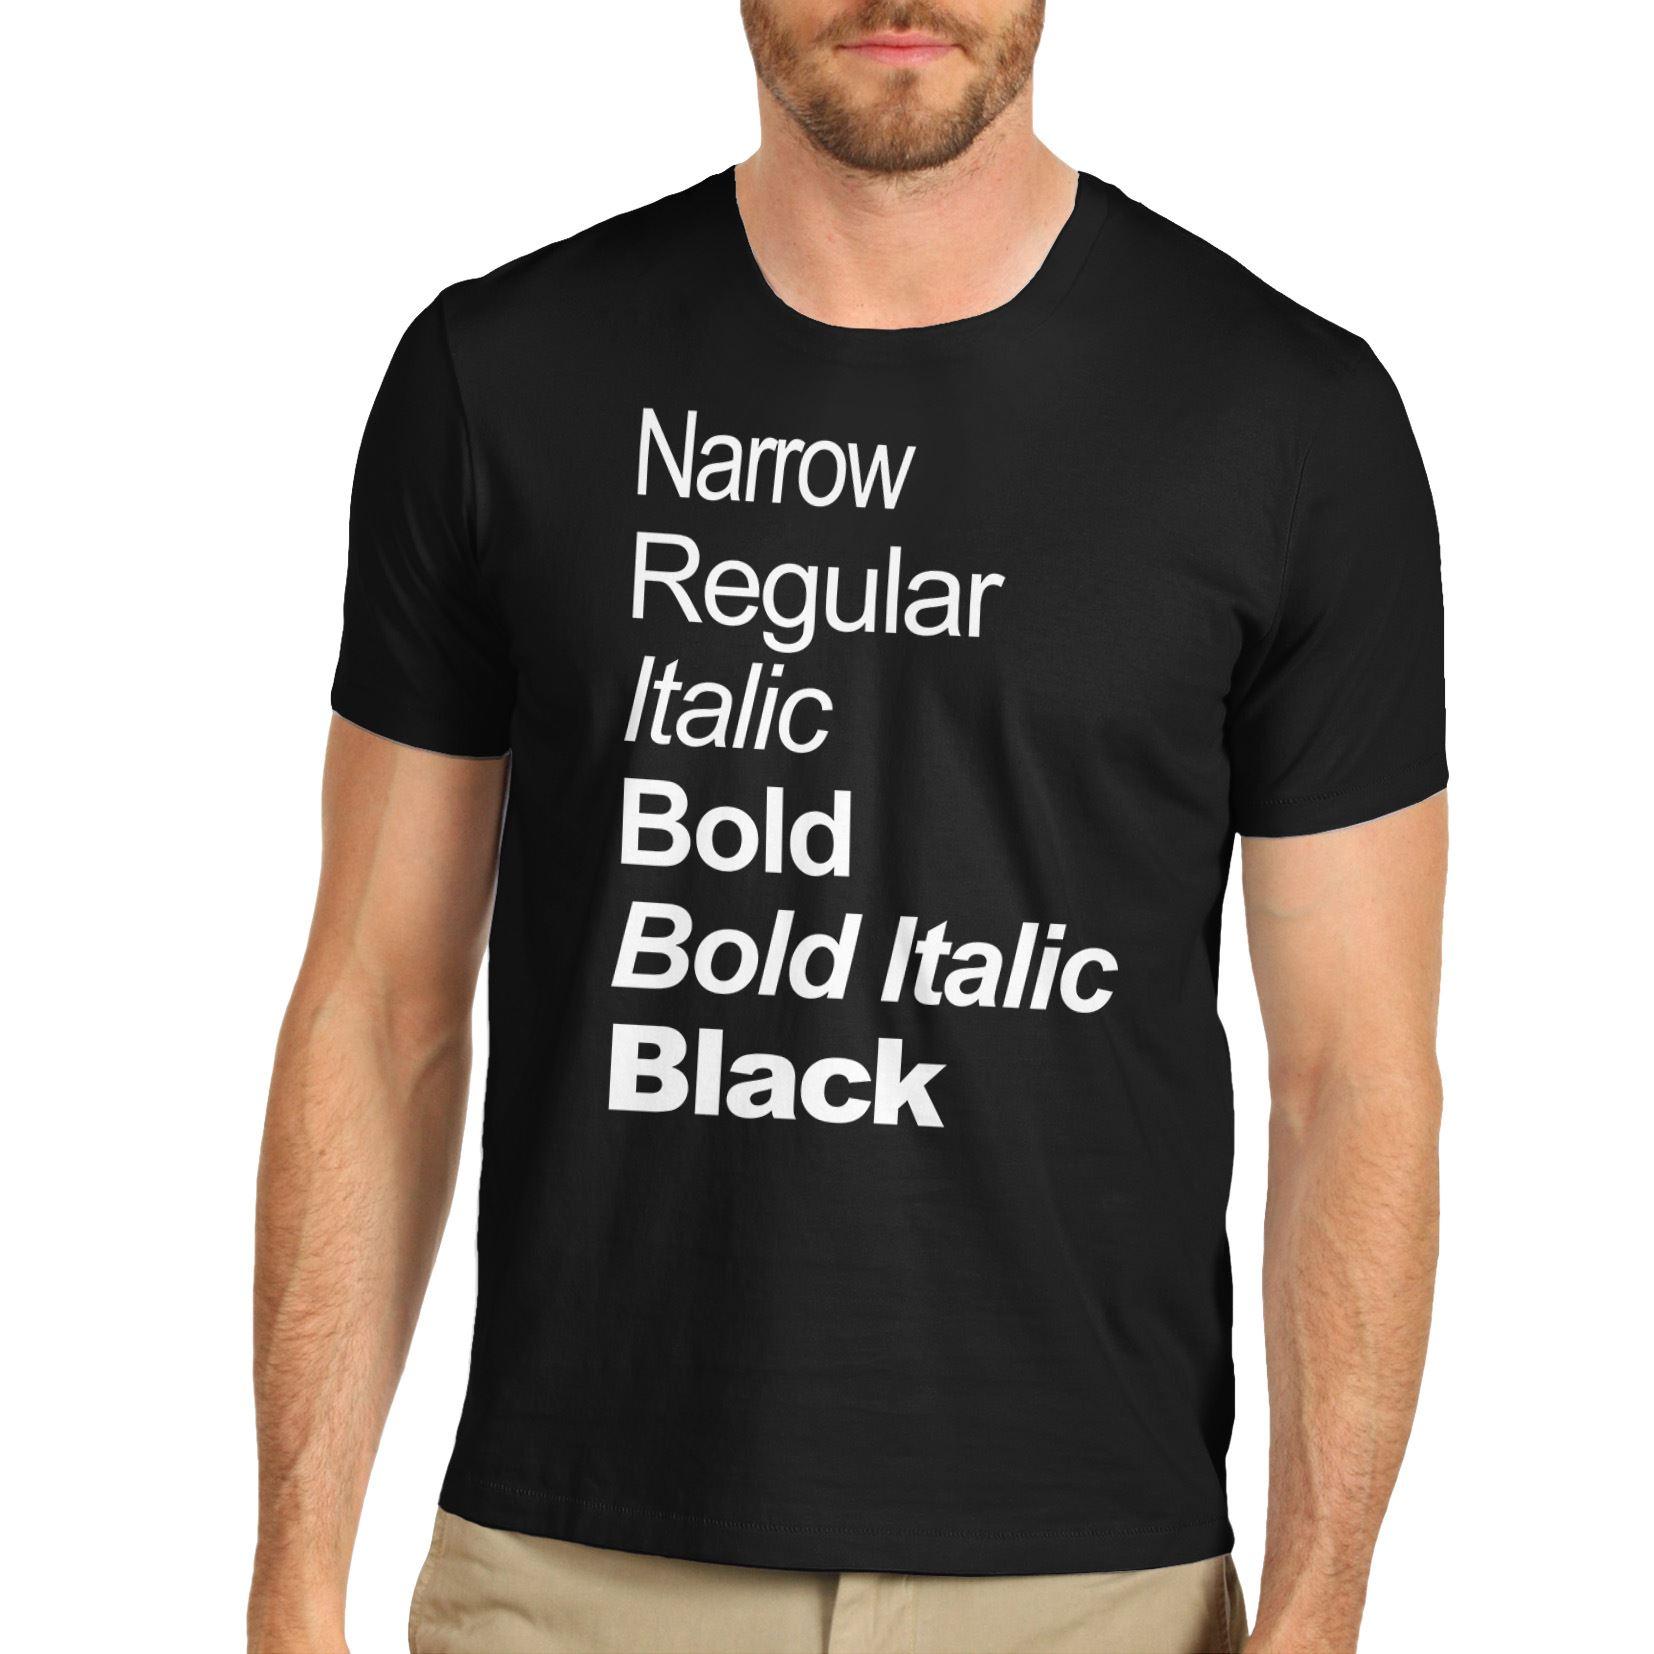 Black t shirt in bulk - Black T Shirt In Bulk Download